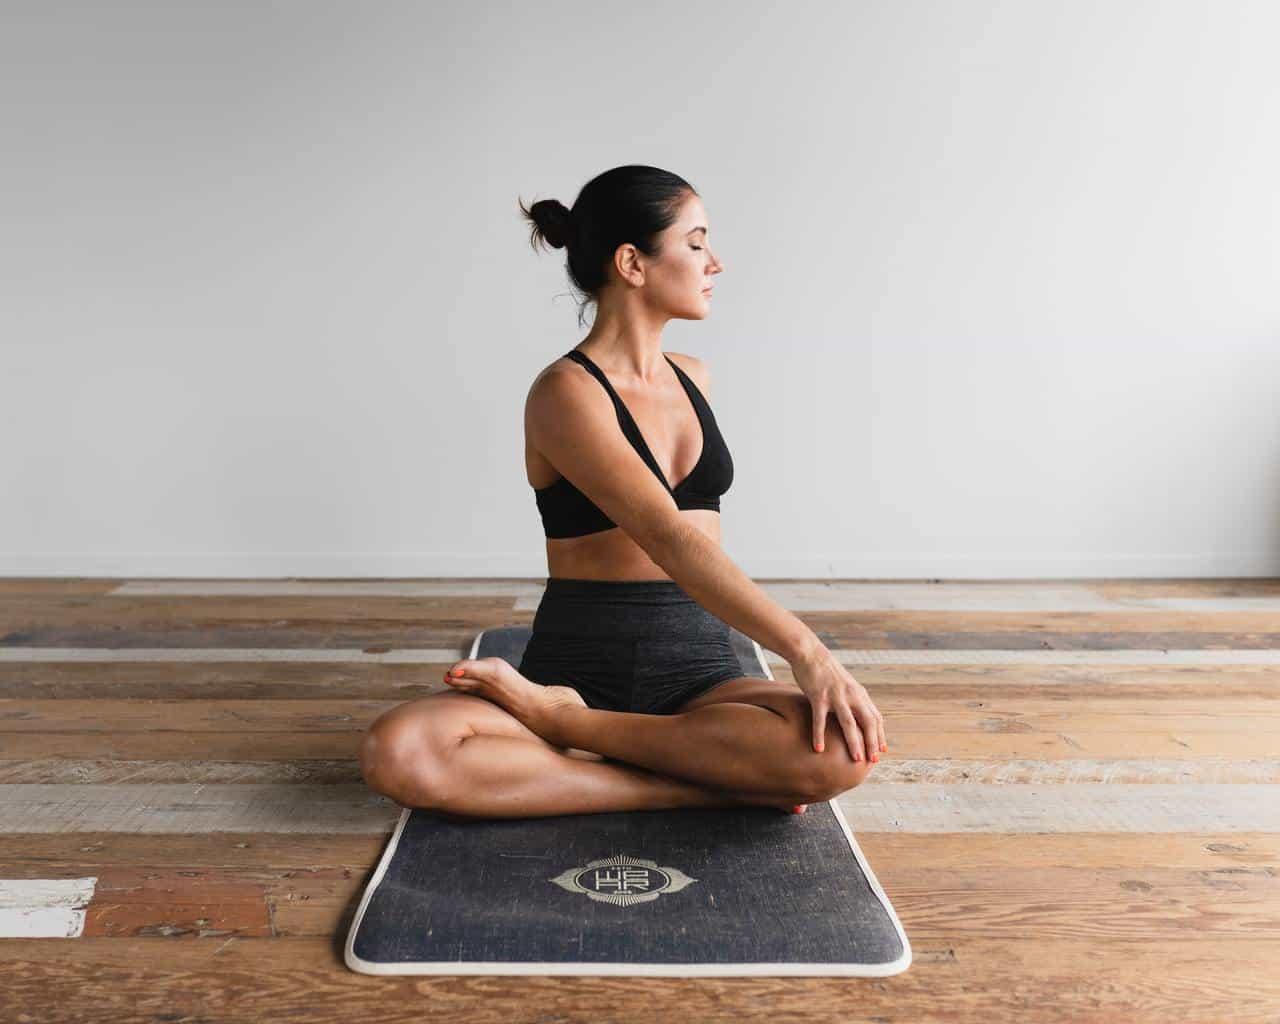 Yogaterapia y Autogestion de la Salud